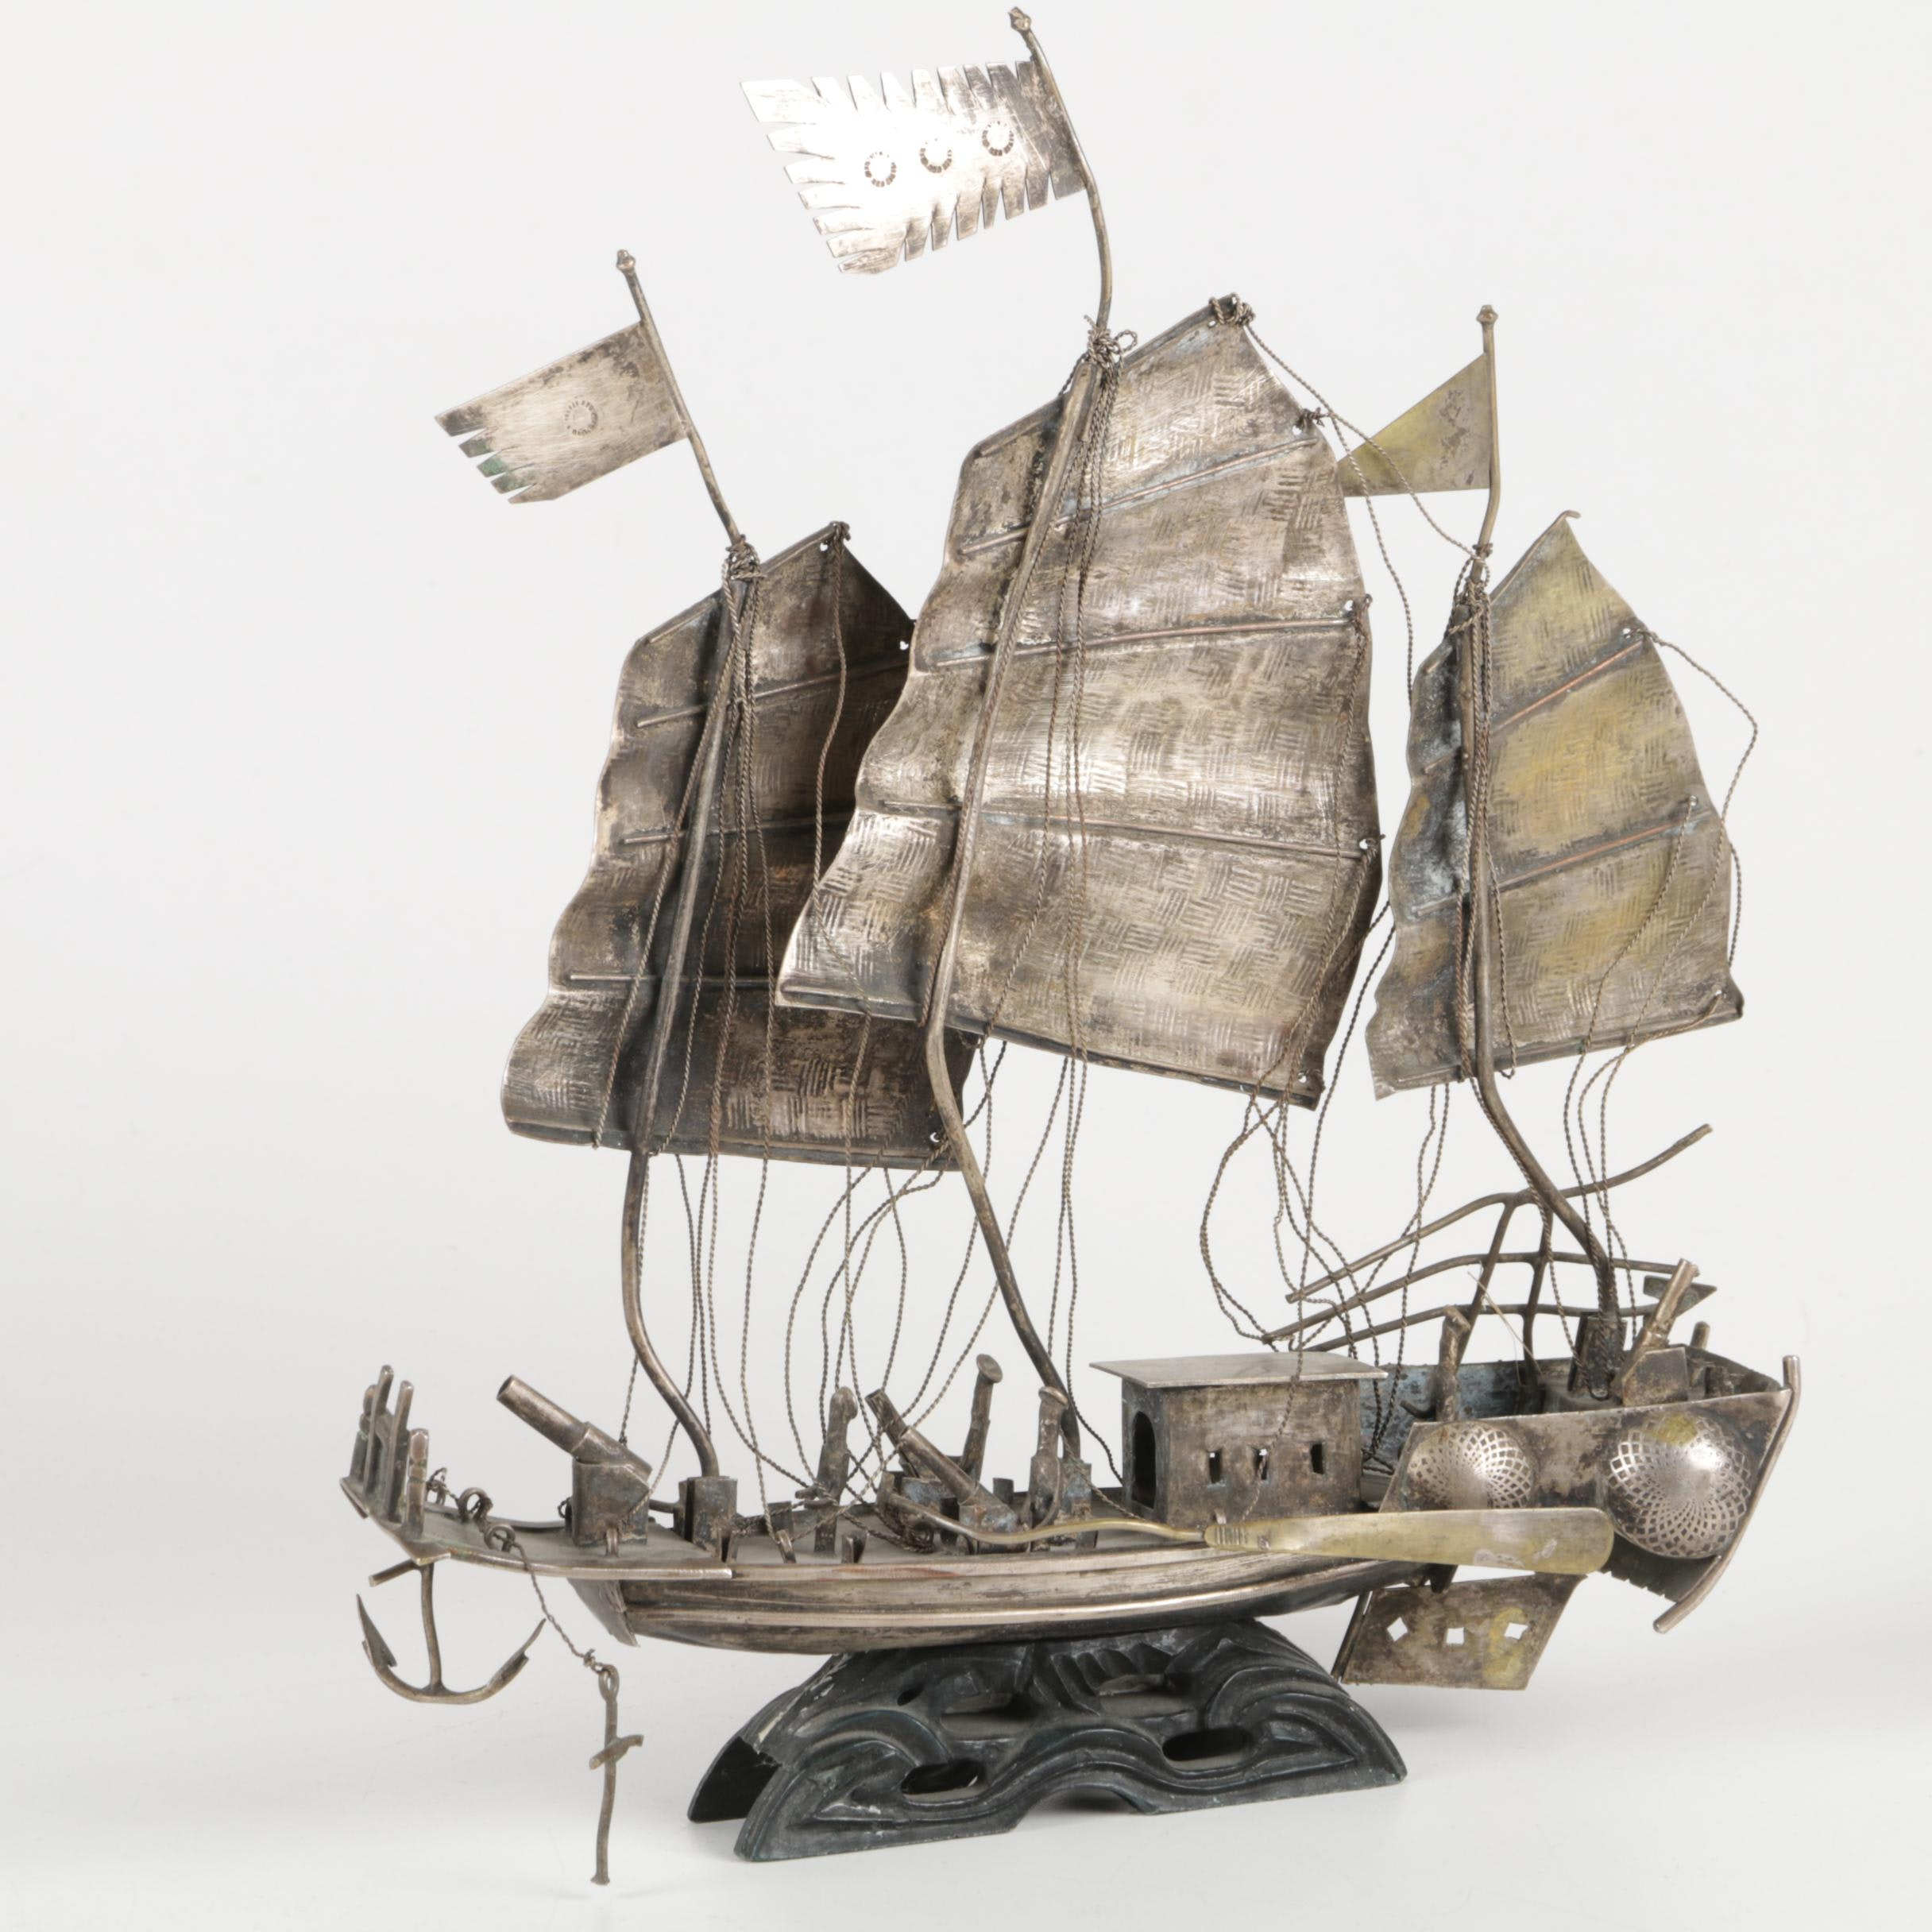 Silver Plate Miniature Three-Mast Ship Sculpture